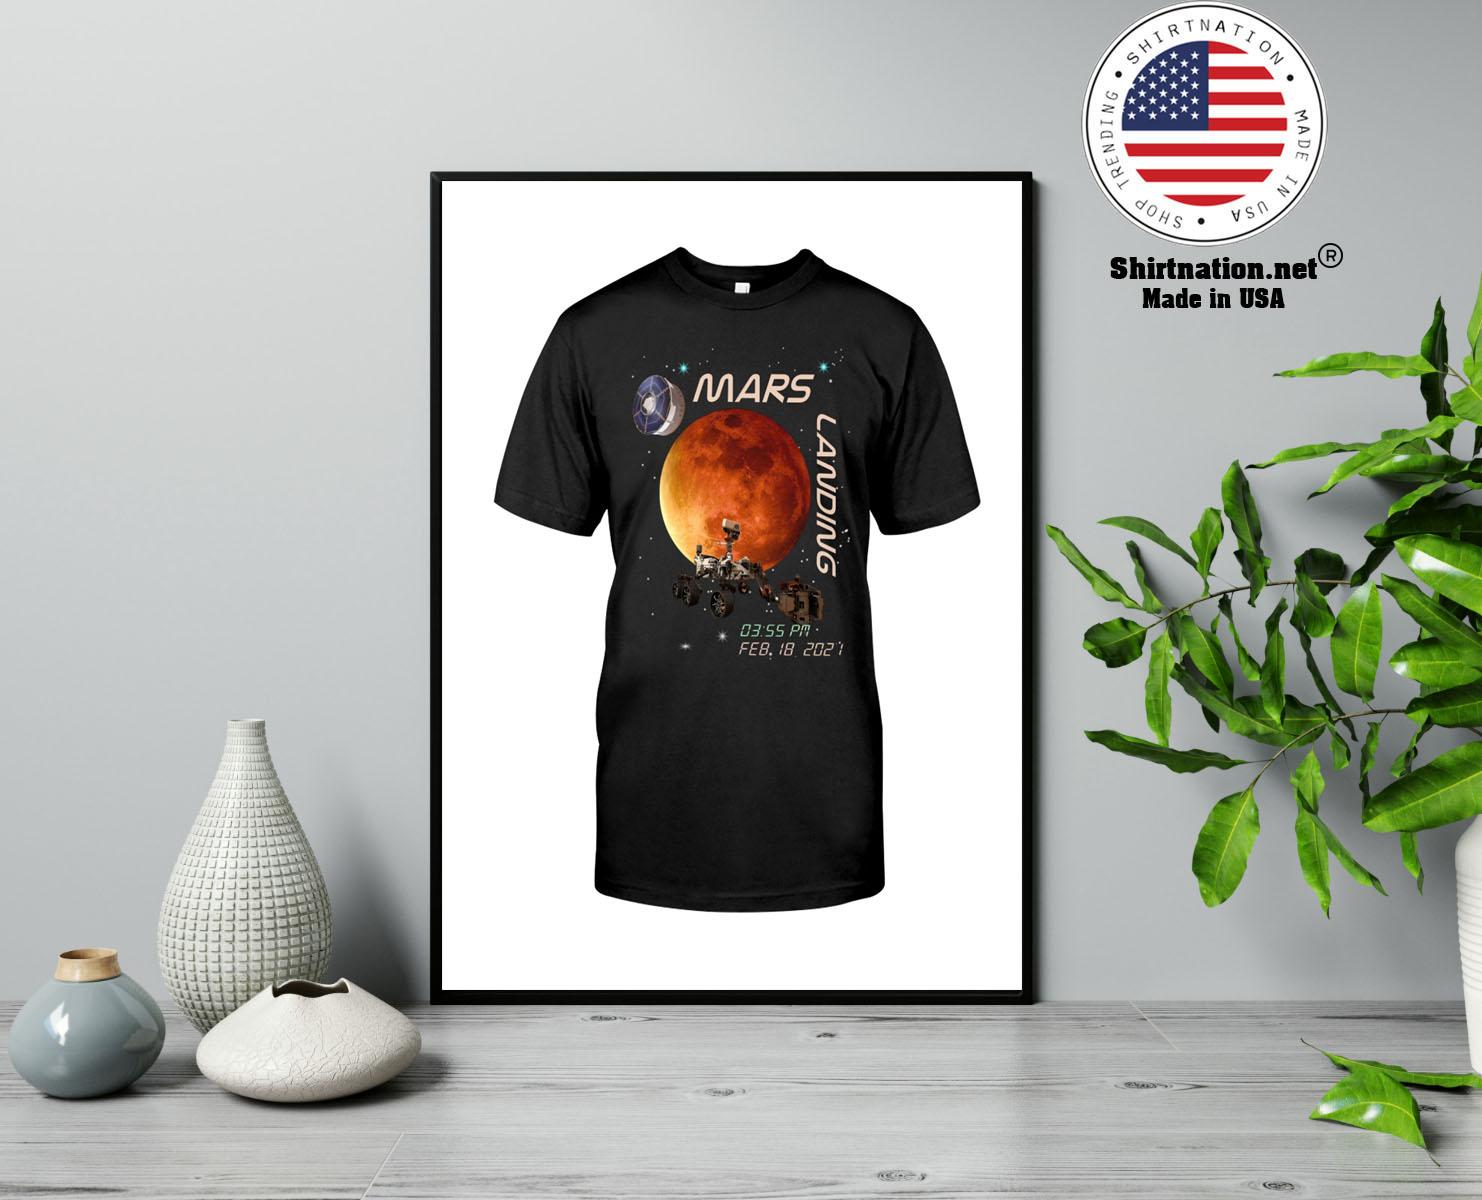 Mars landing february 18 2021 shirt 13